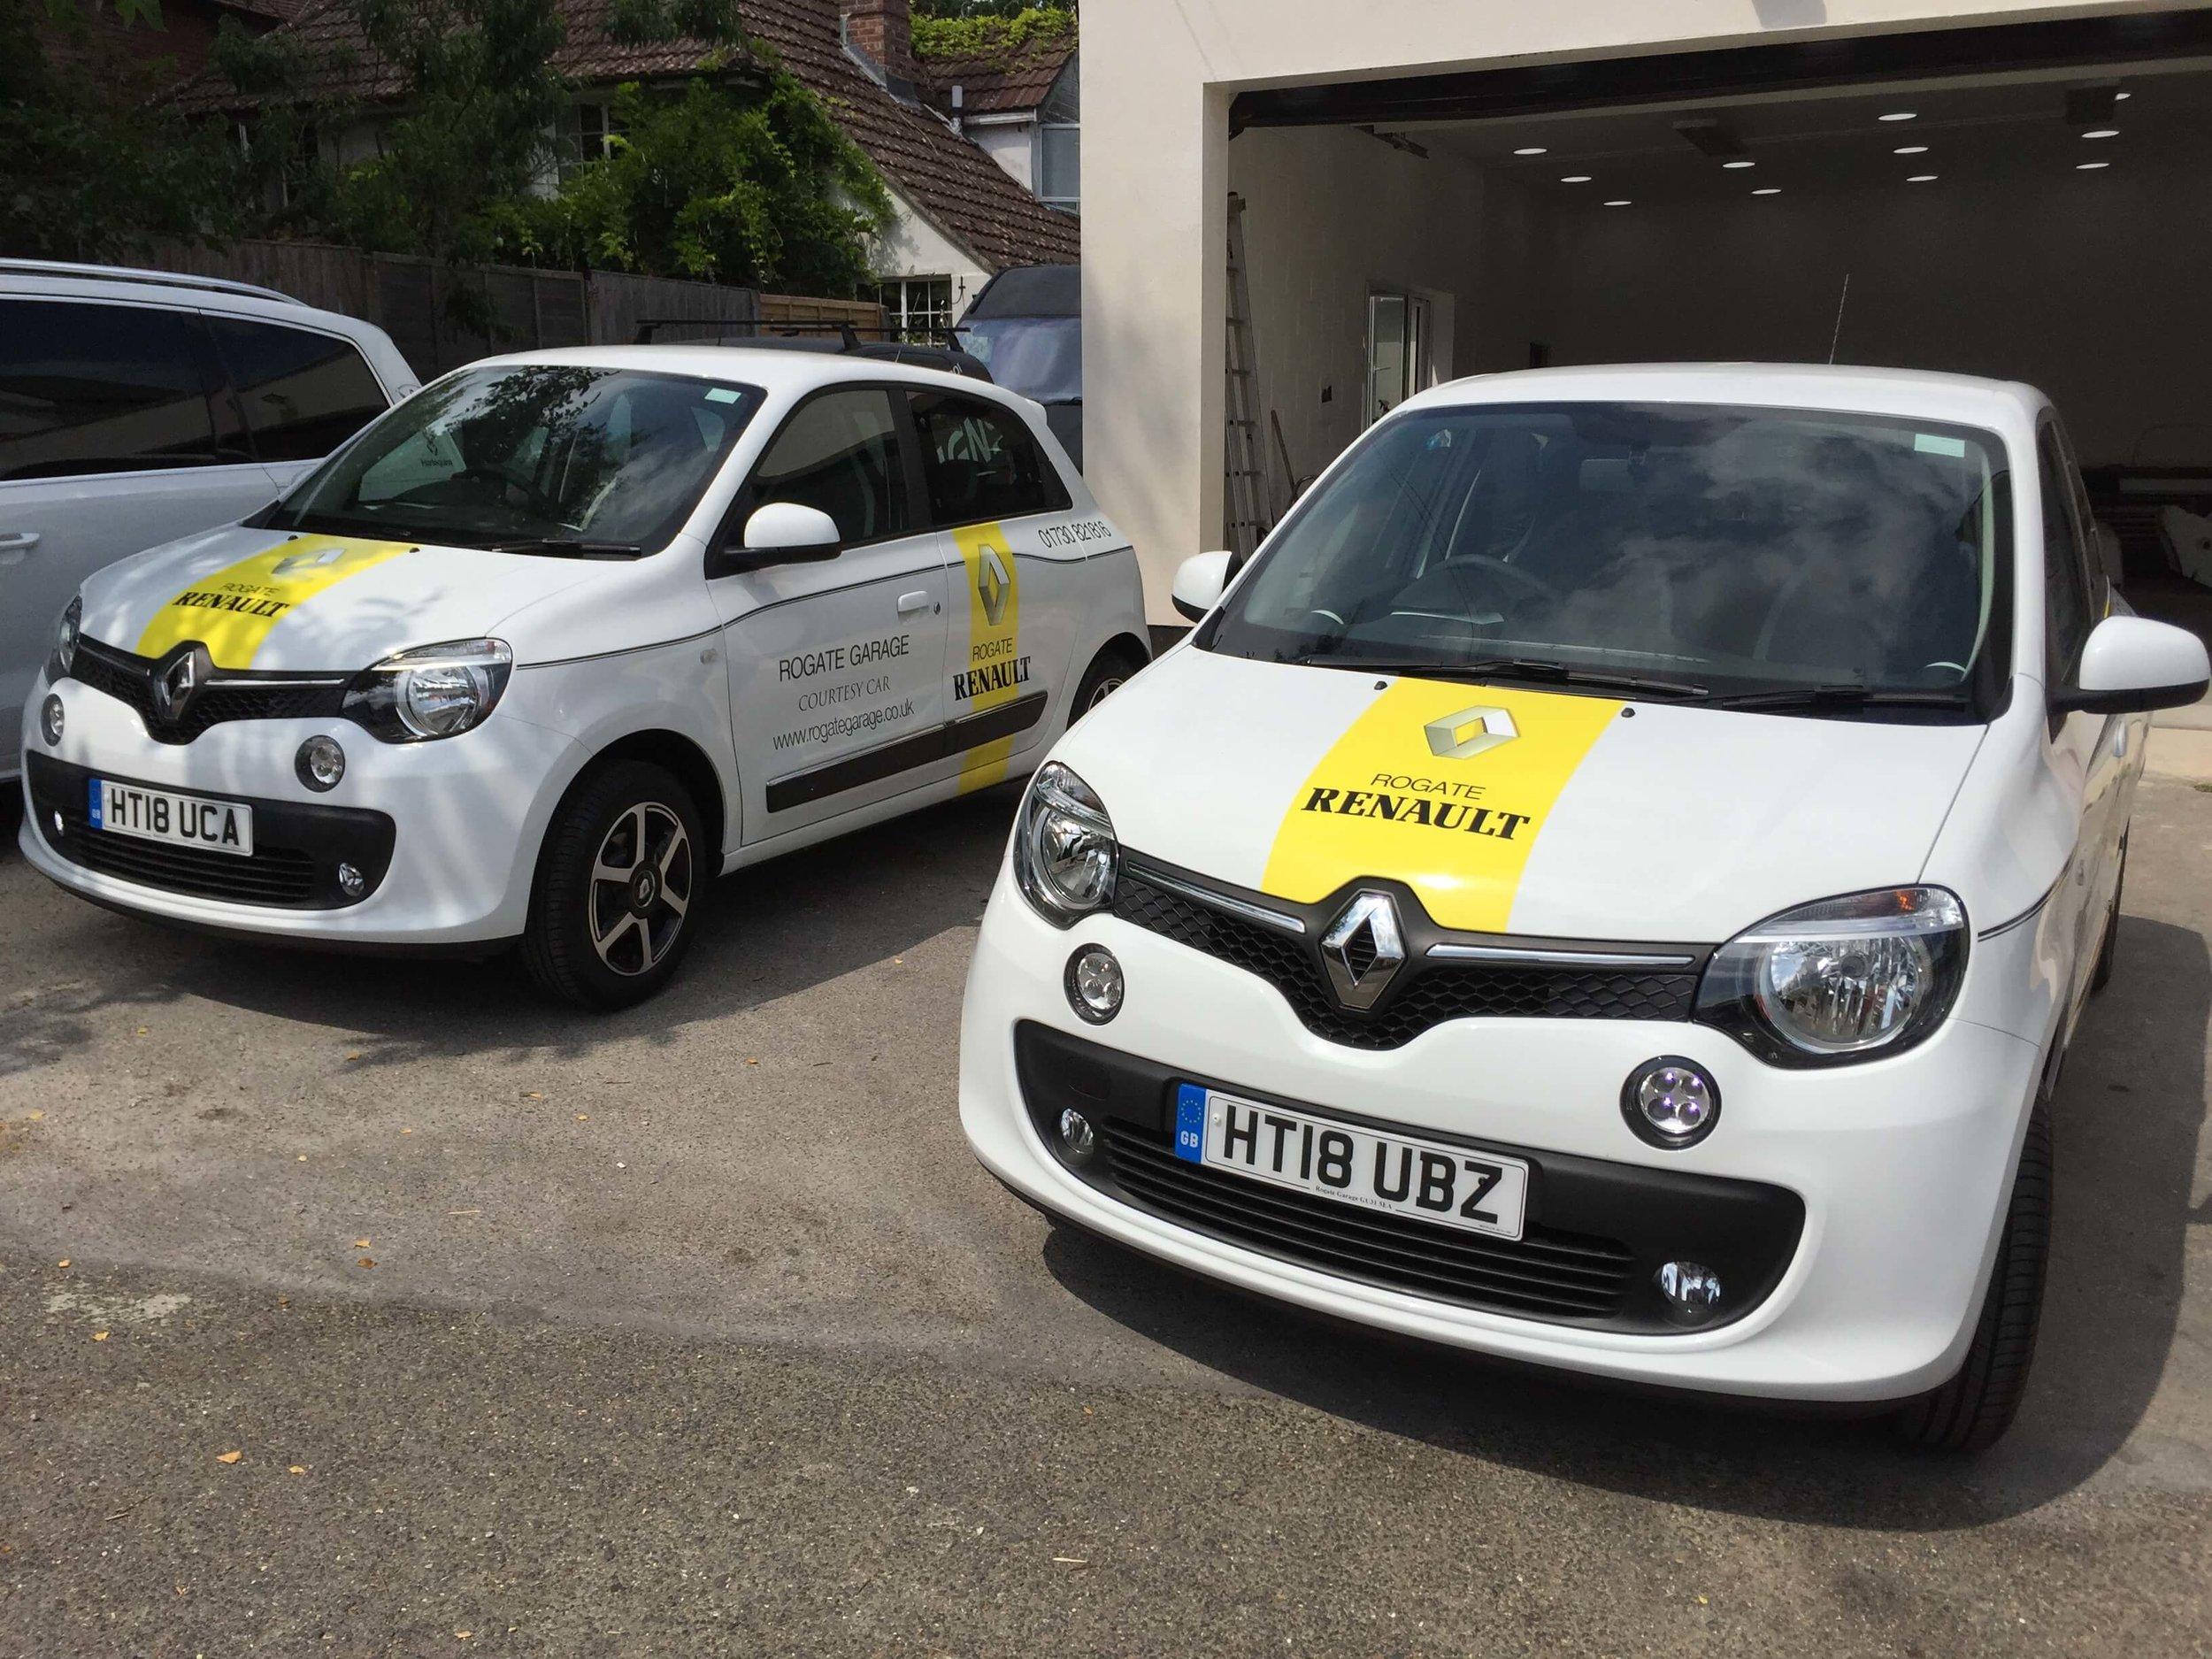 Renault Car Graphics